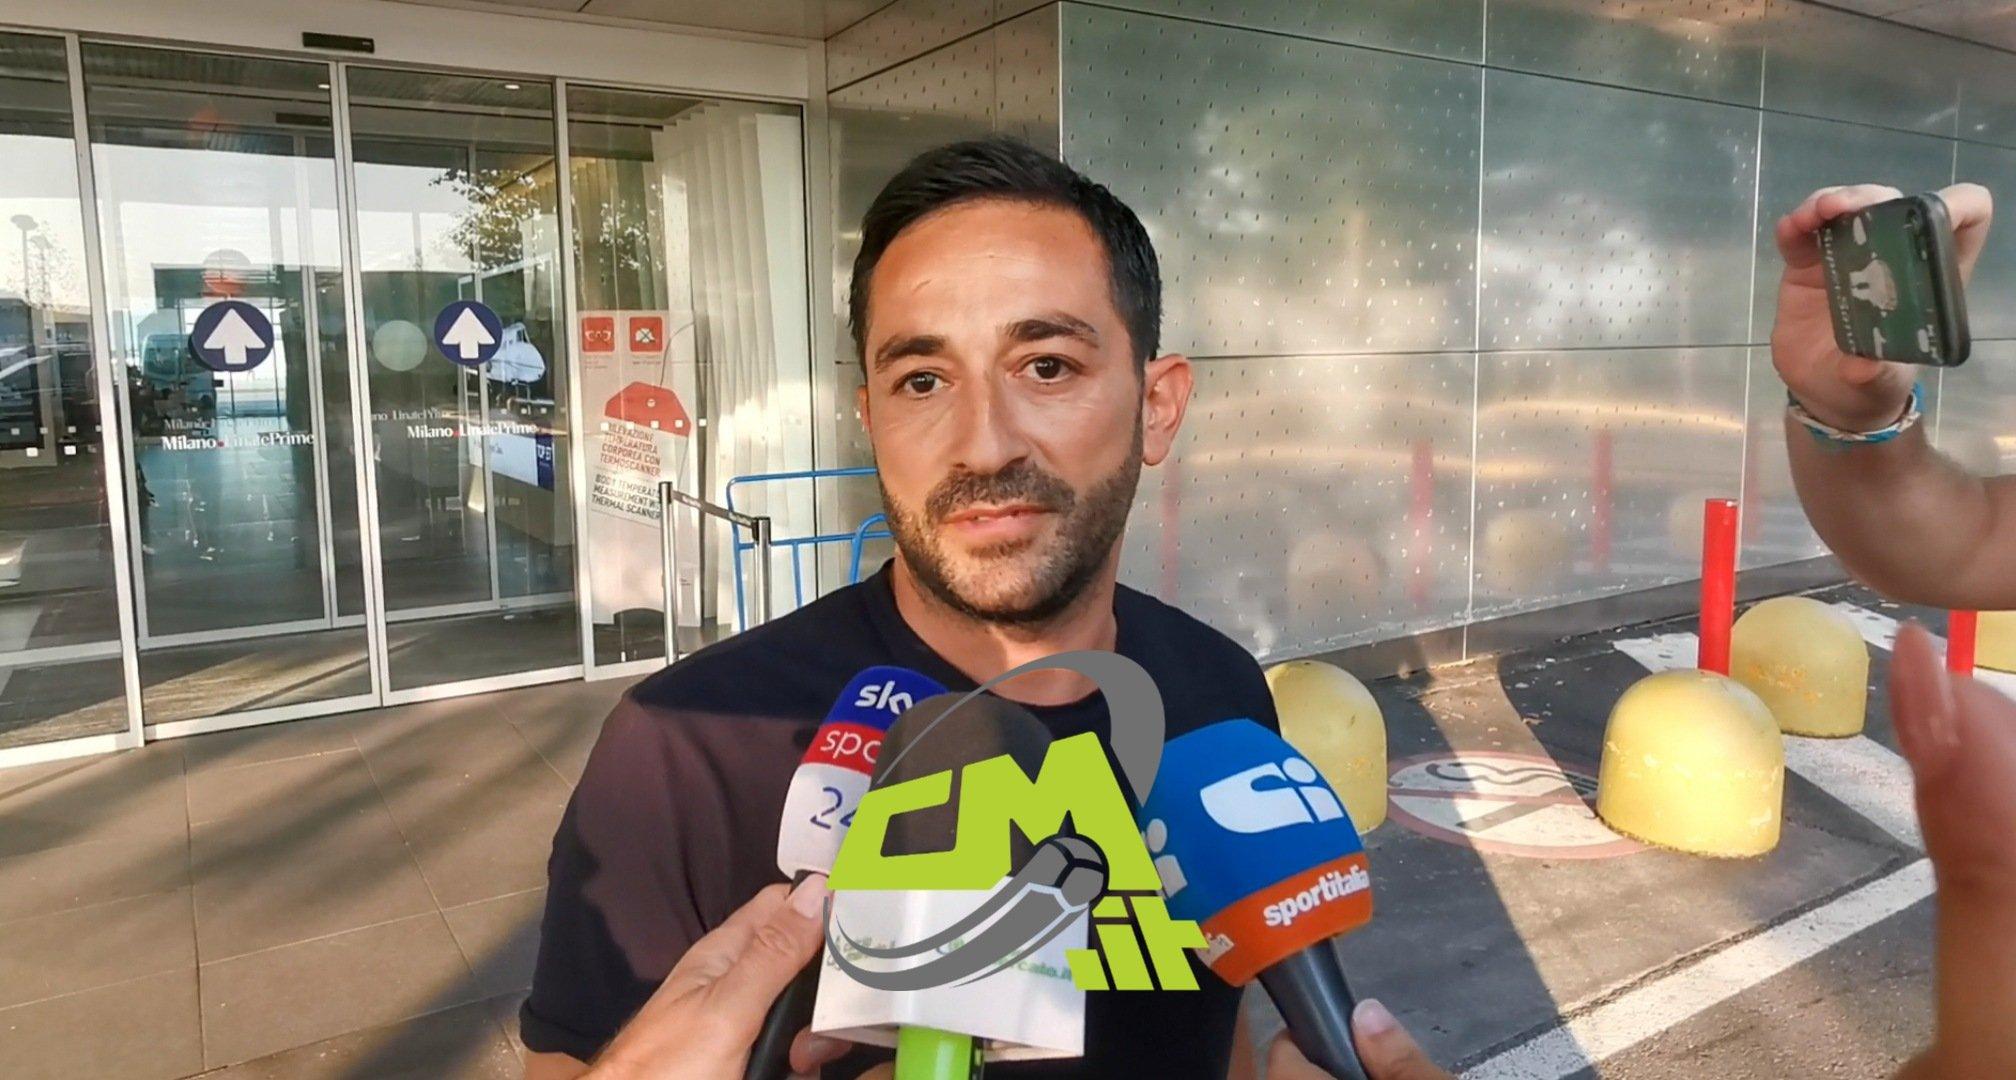 Inter, agente rivela: piste calde in uscita e in entrata |  Sport e Vai